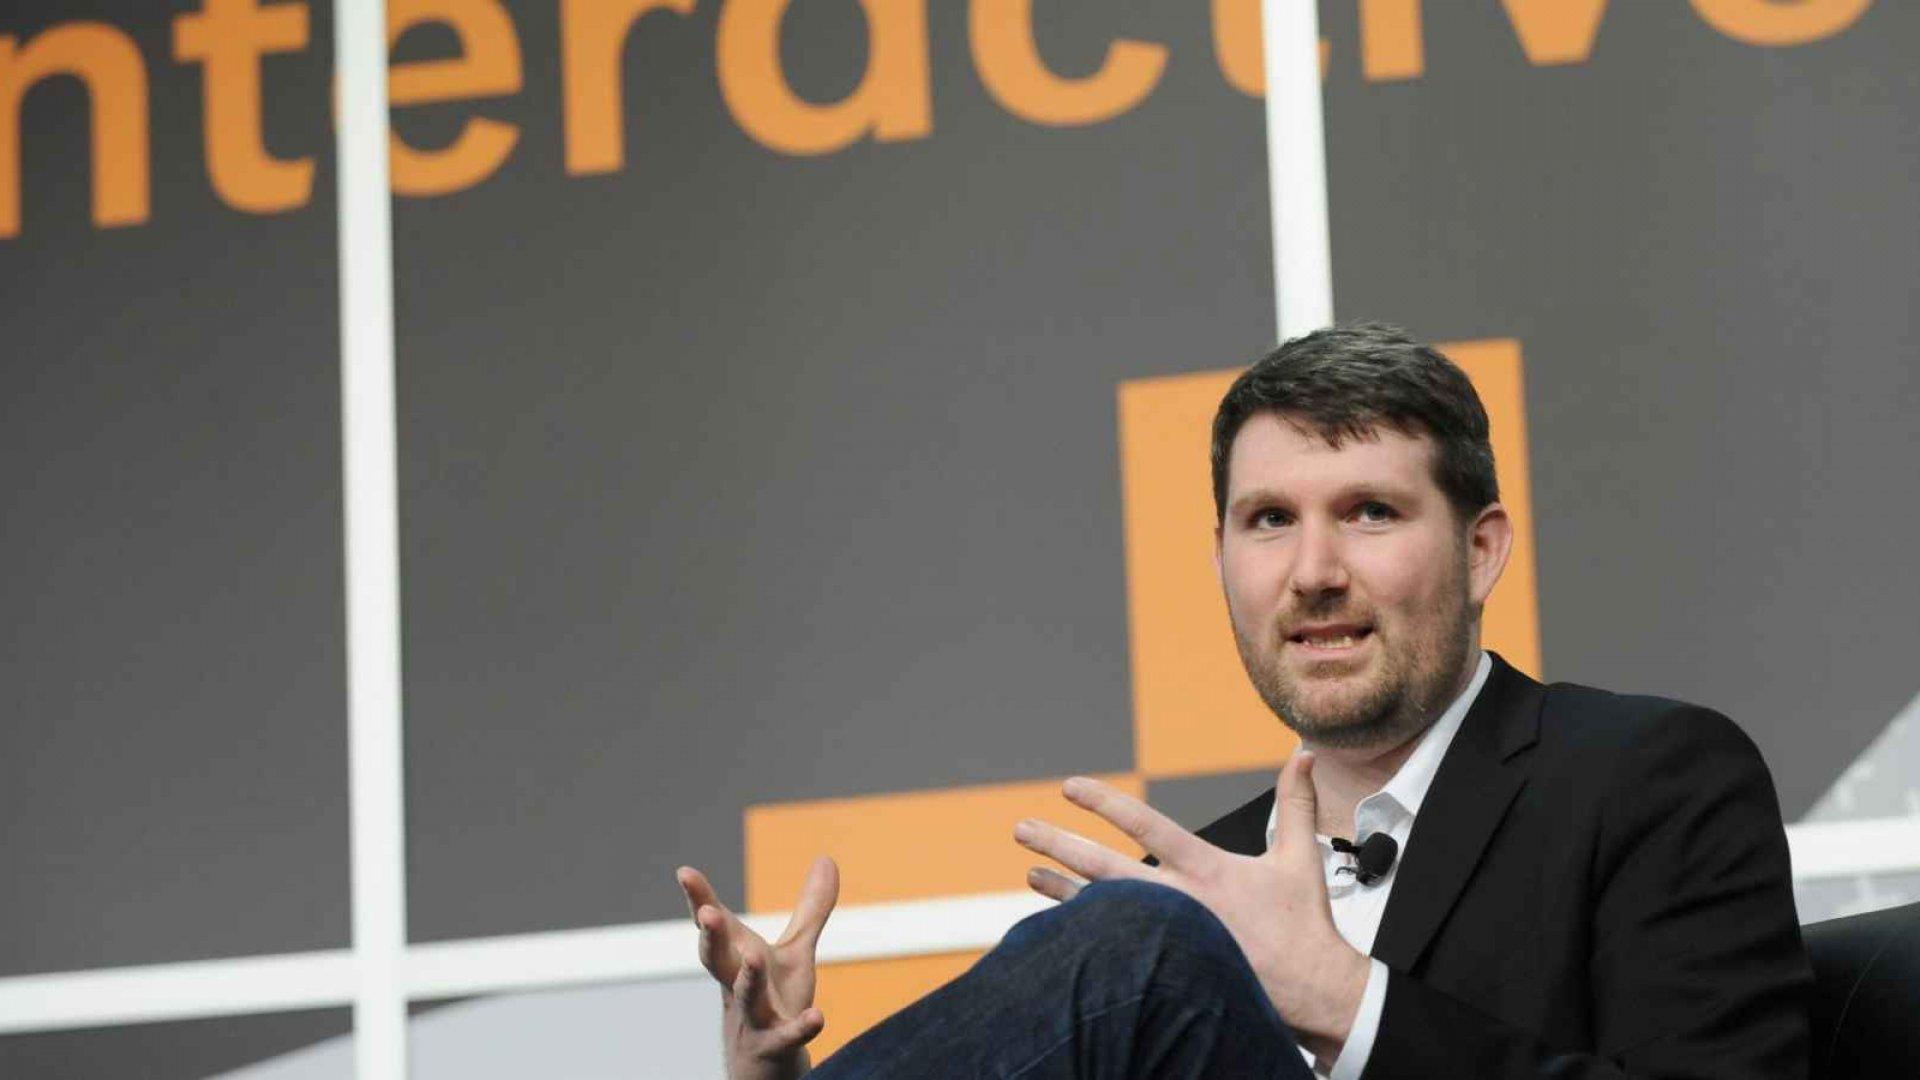 Upworthy Unveils Plans to Produce Original Content